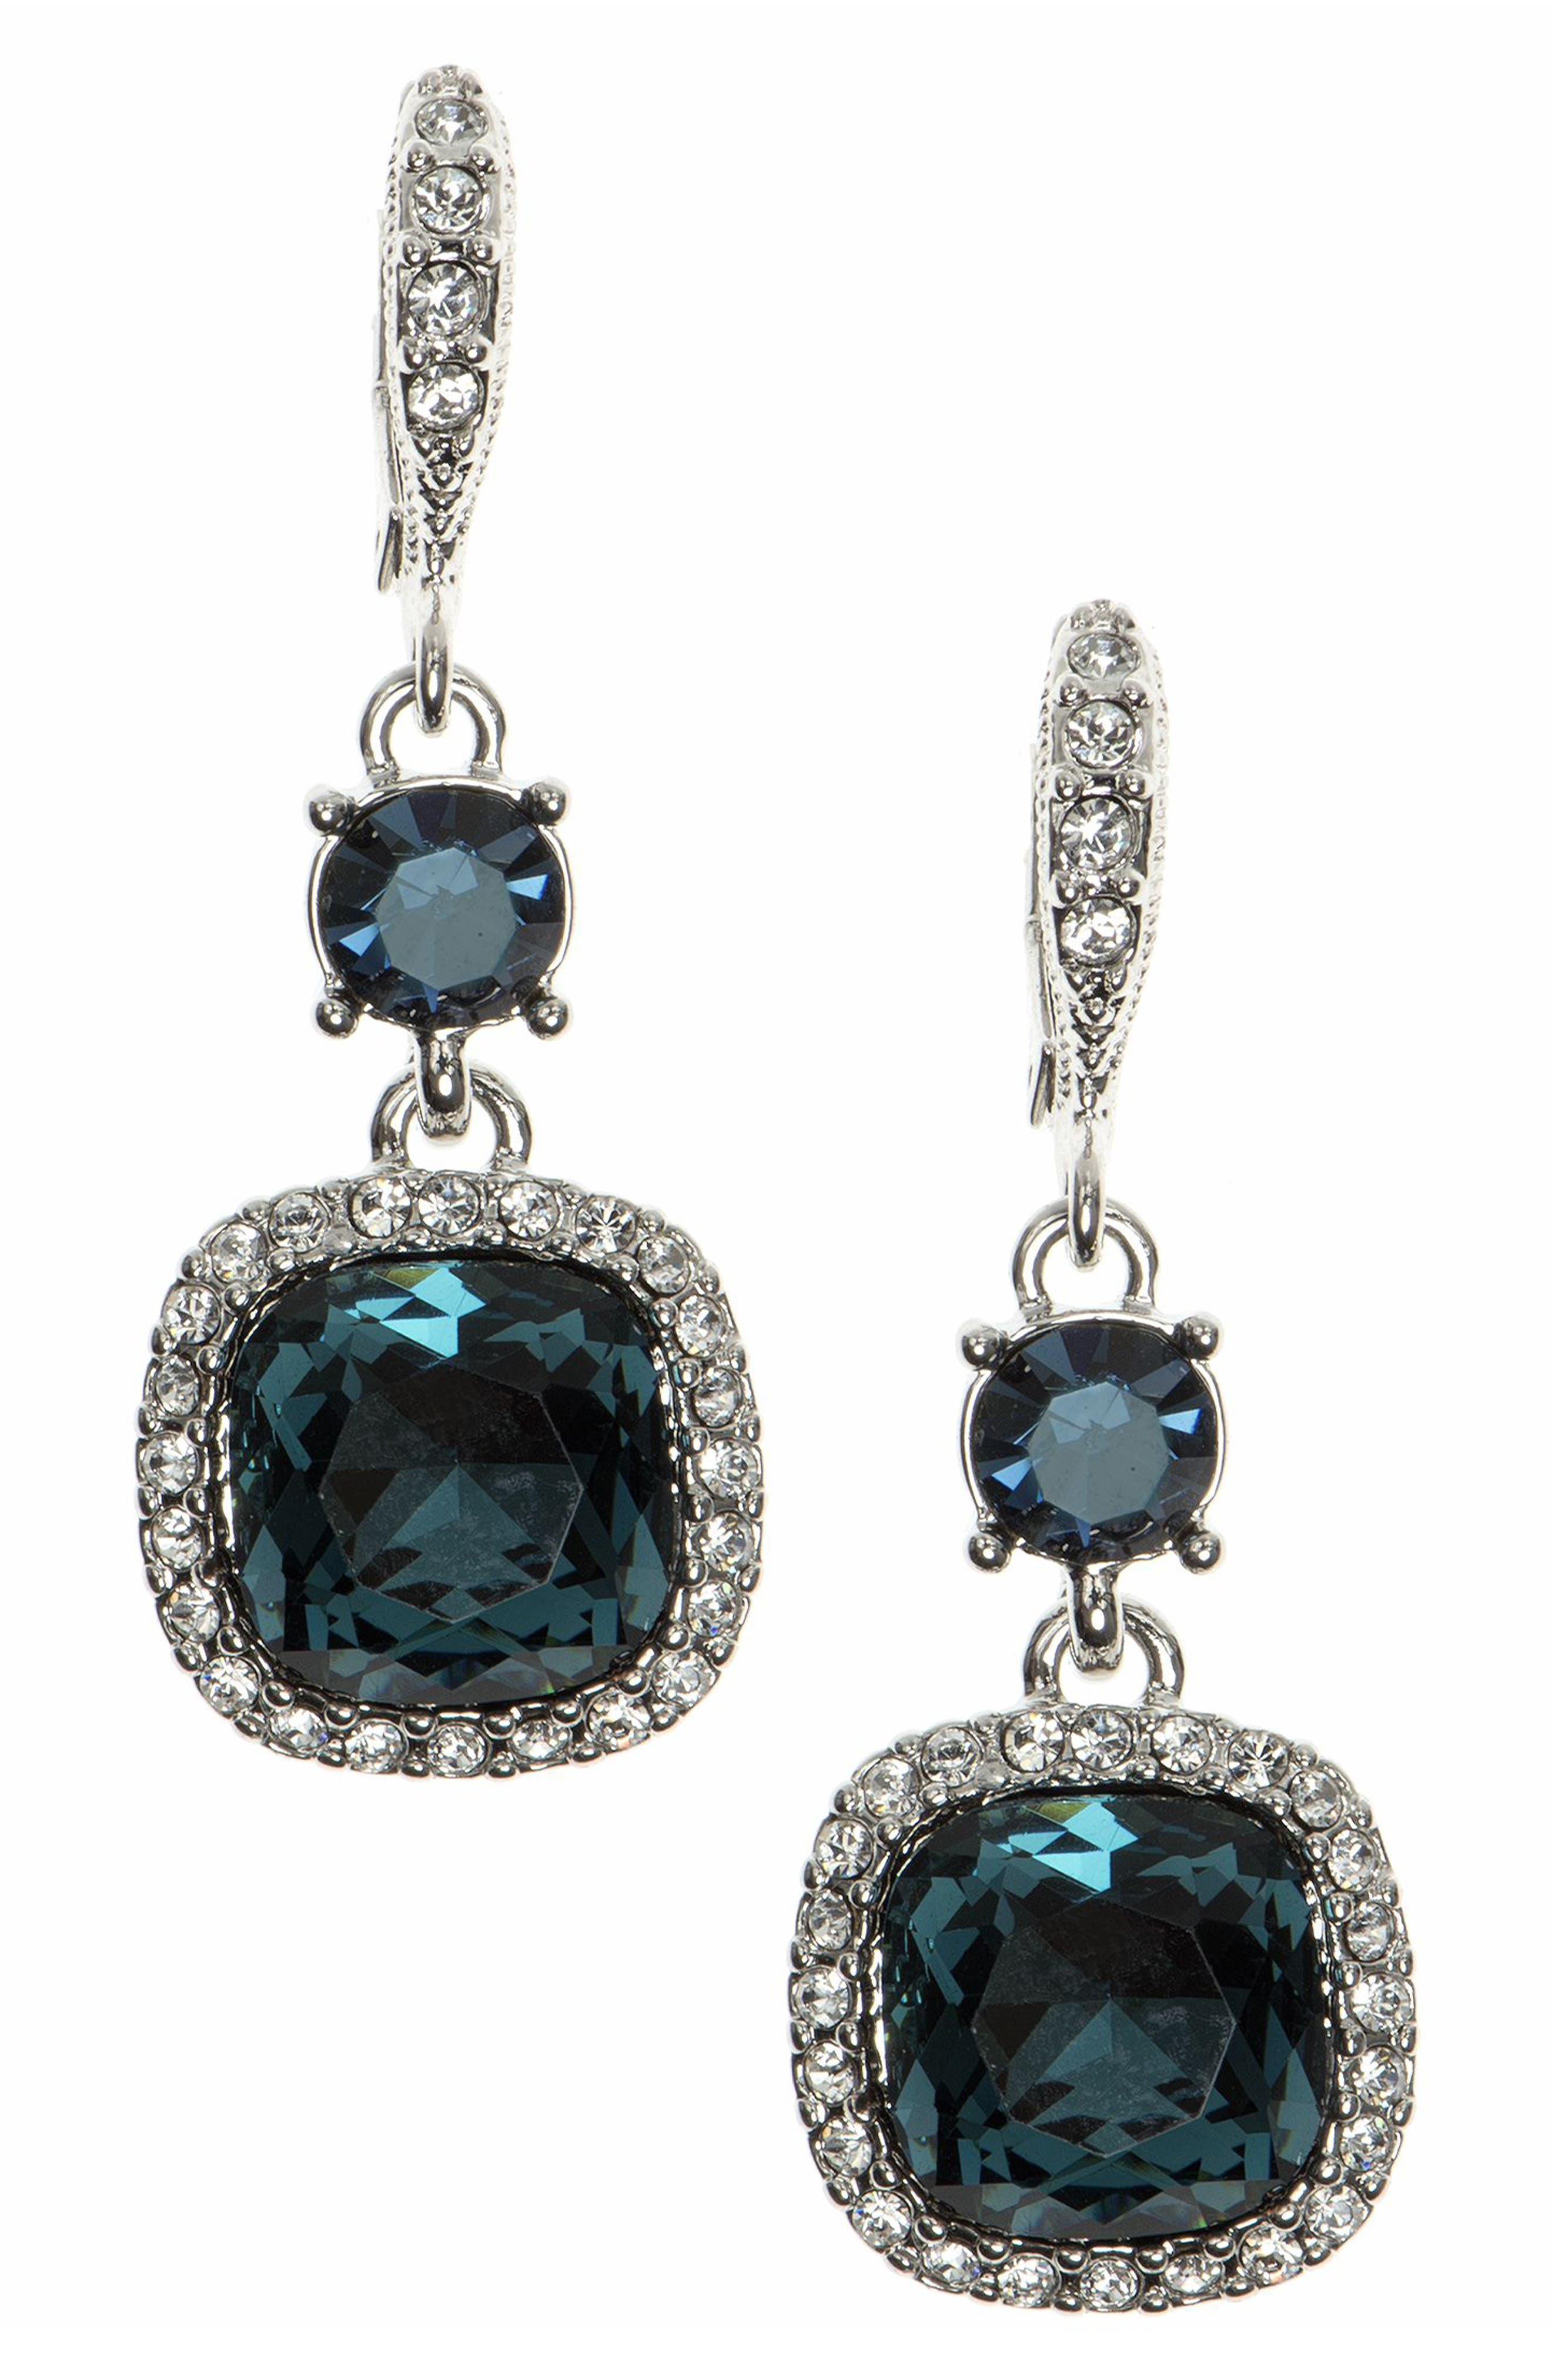 Crystal Drop Earrings,                             Main thumbnail 1, color,                             BLUE / SILVER